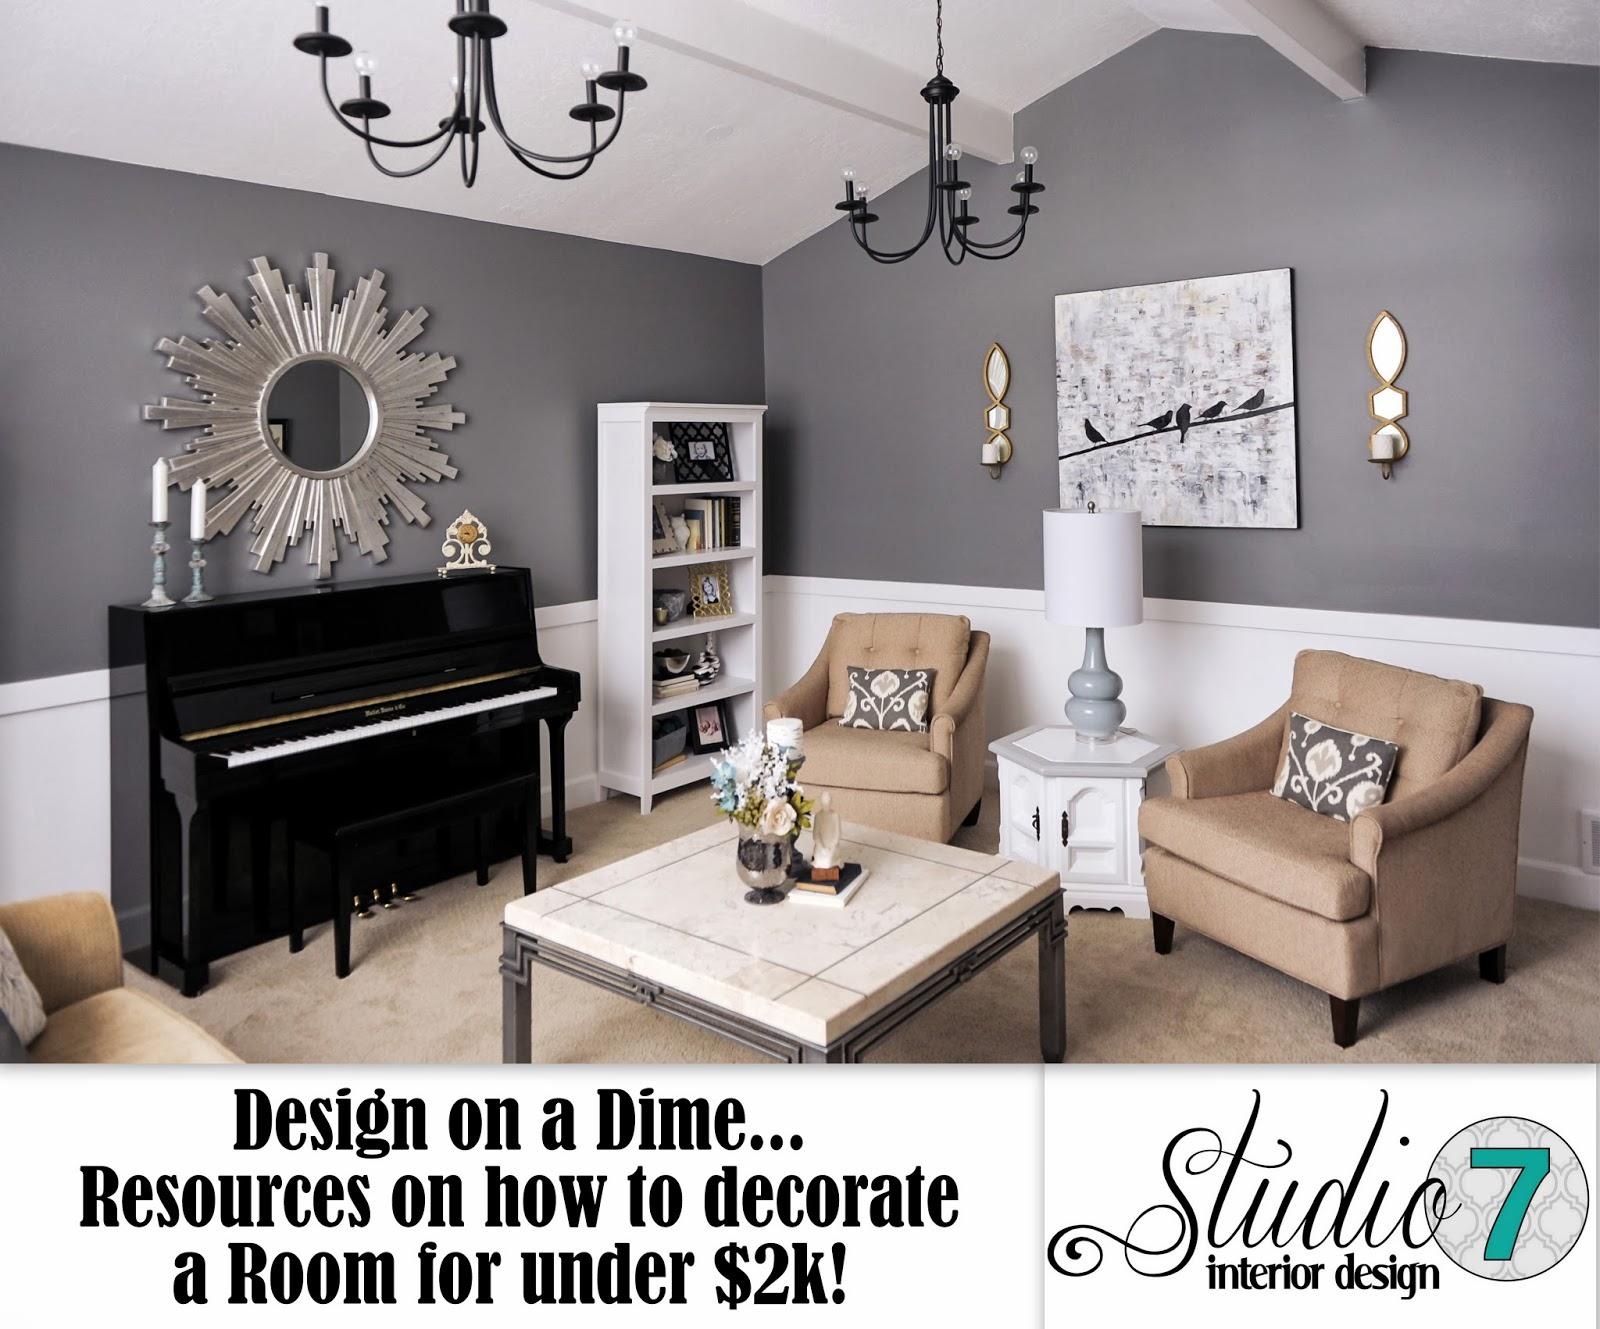 Small Living Room Idea Uk Victorian Ideas Studio 7 Interior Design: Client Reveal:transitional Chic ...